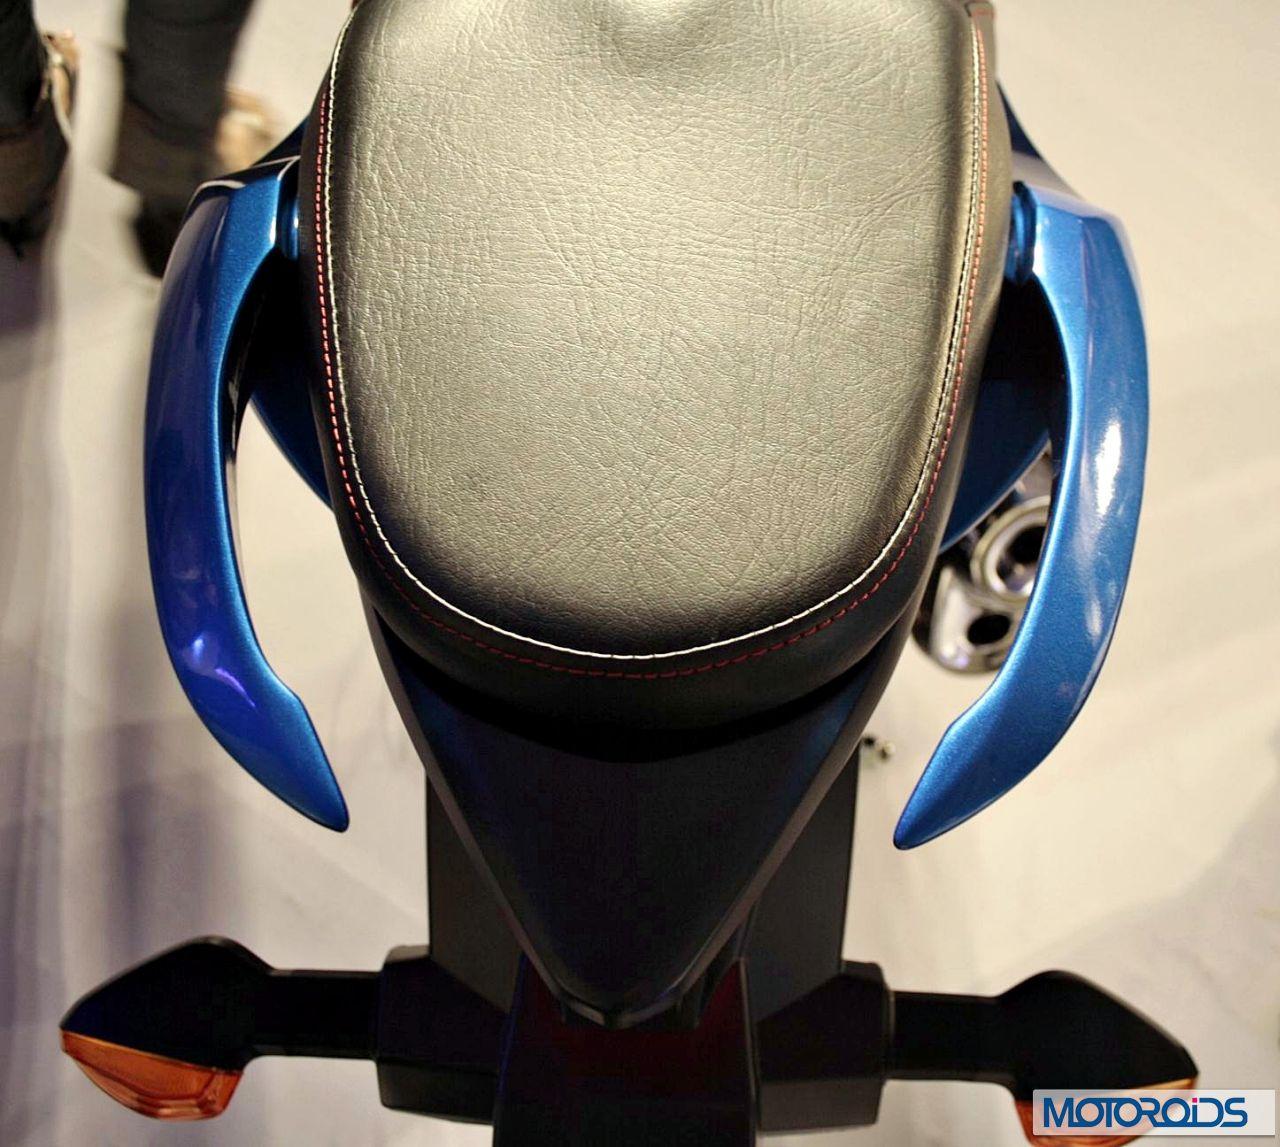 Yamaha FZS Fi Vs Suzuki Gixxer 155: Features And Tech